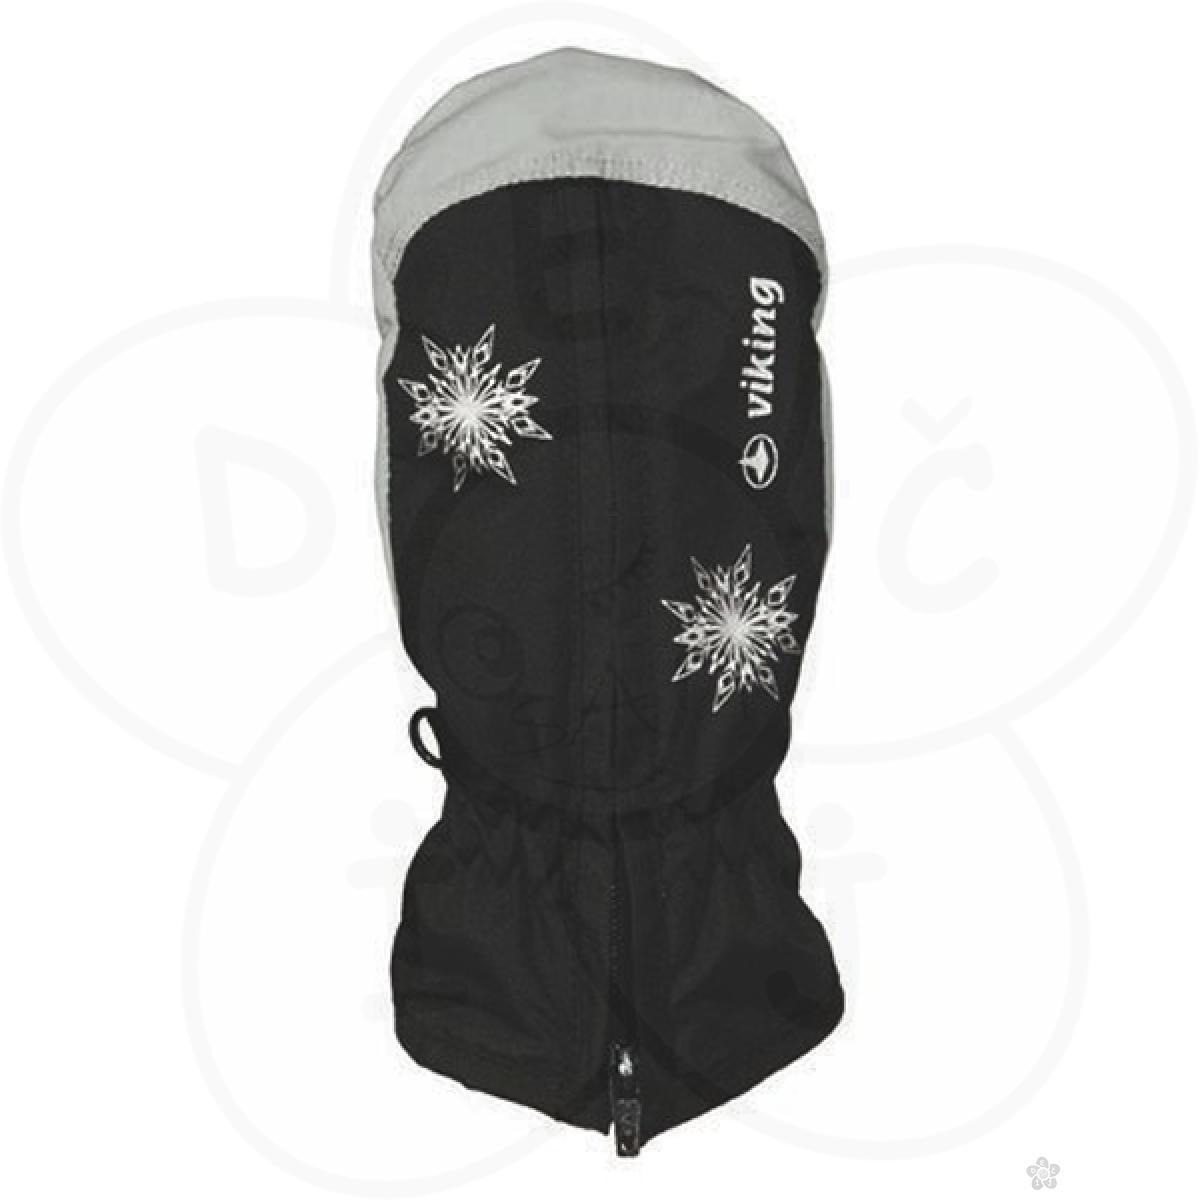 Ski rukavice Viking kid starlet black grey SSKI12515519509